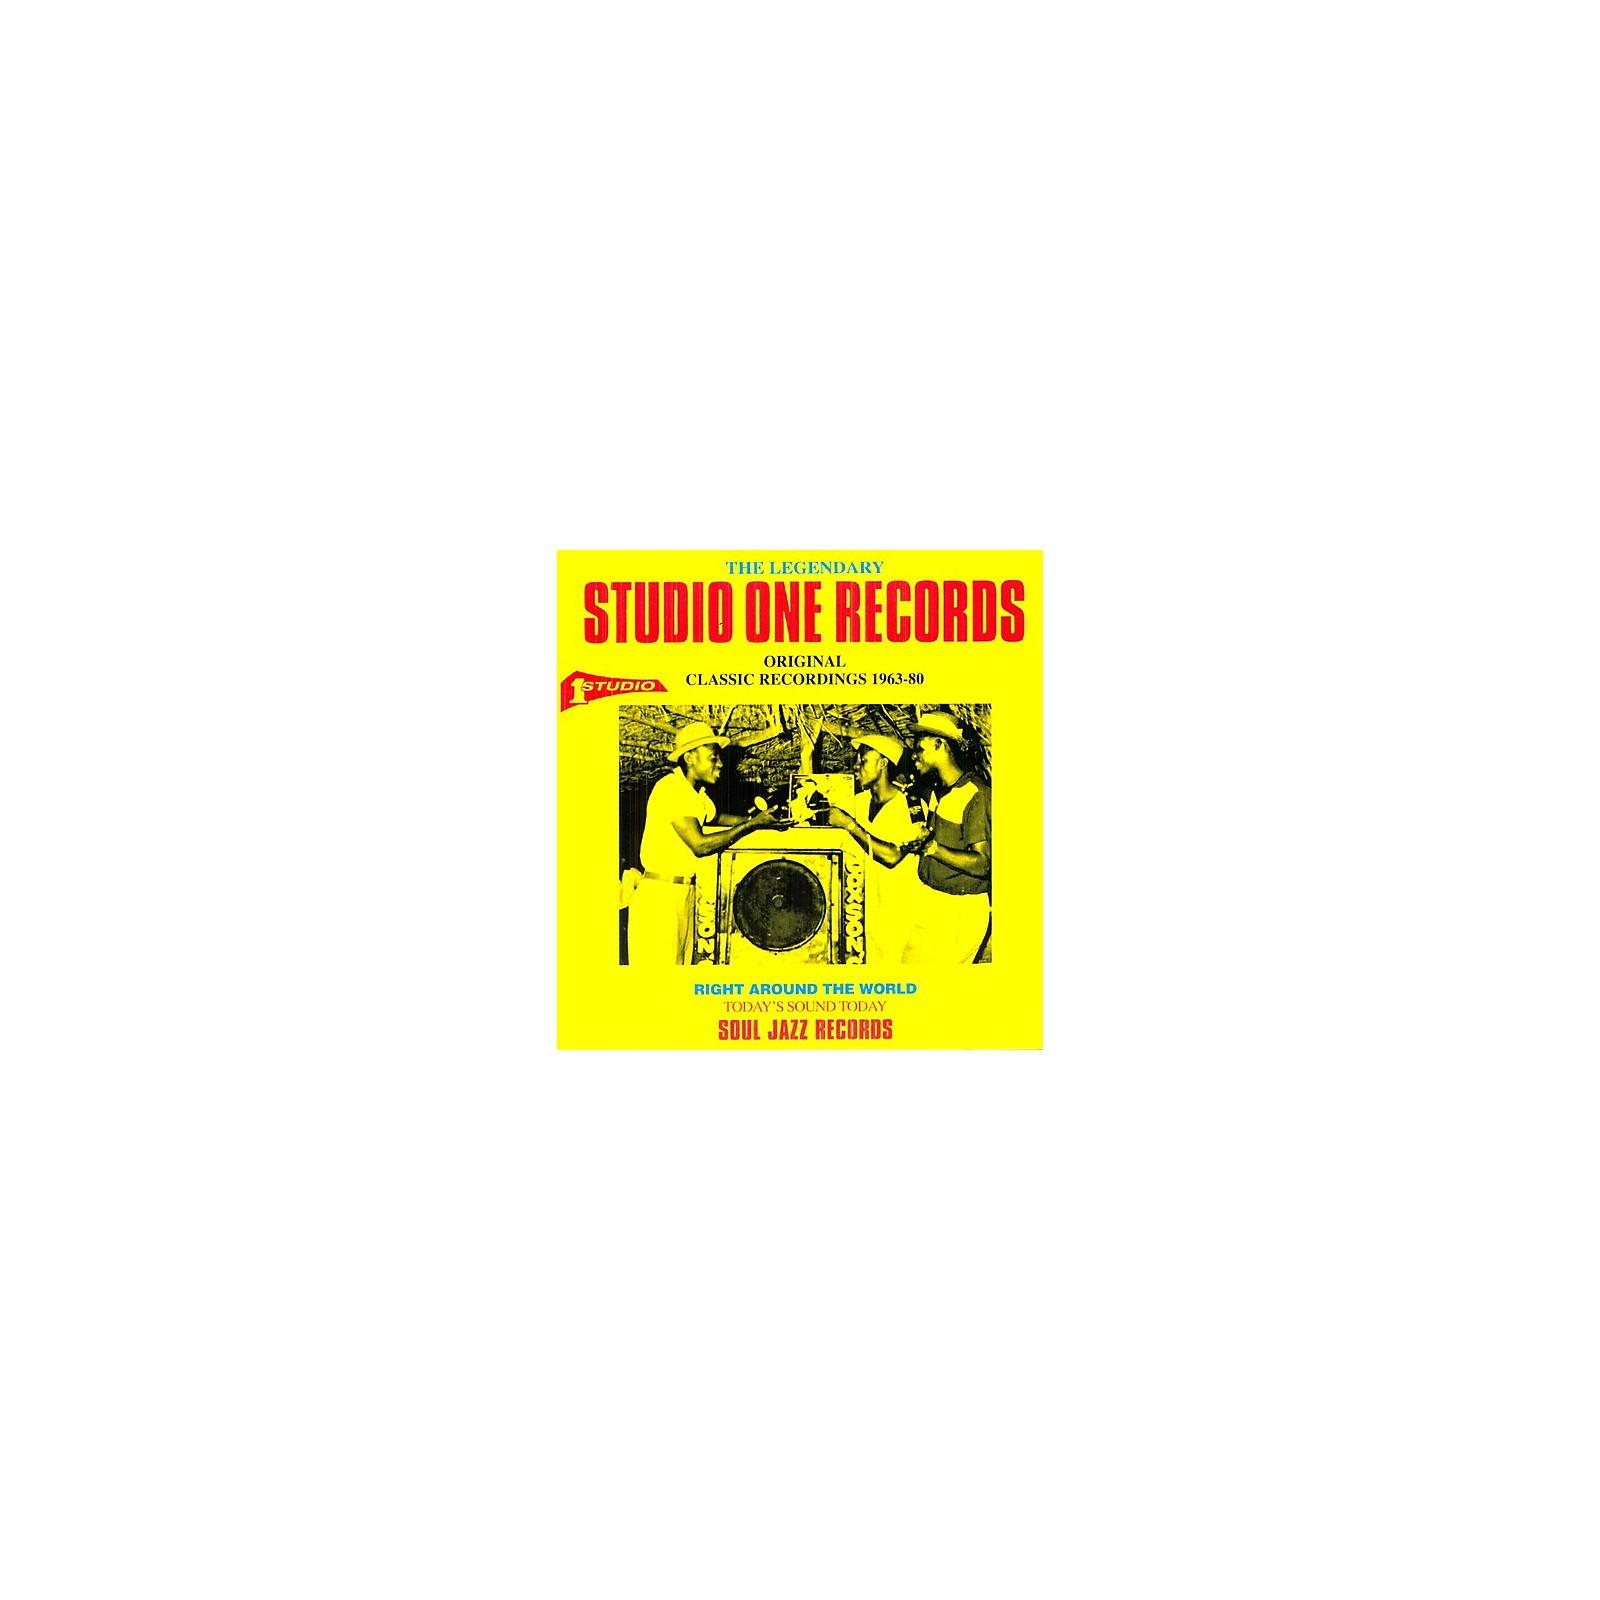 Alliance Various Artists - The Legendary Studio One Records: Original Classic Recordings 1963-80